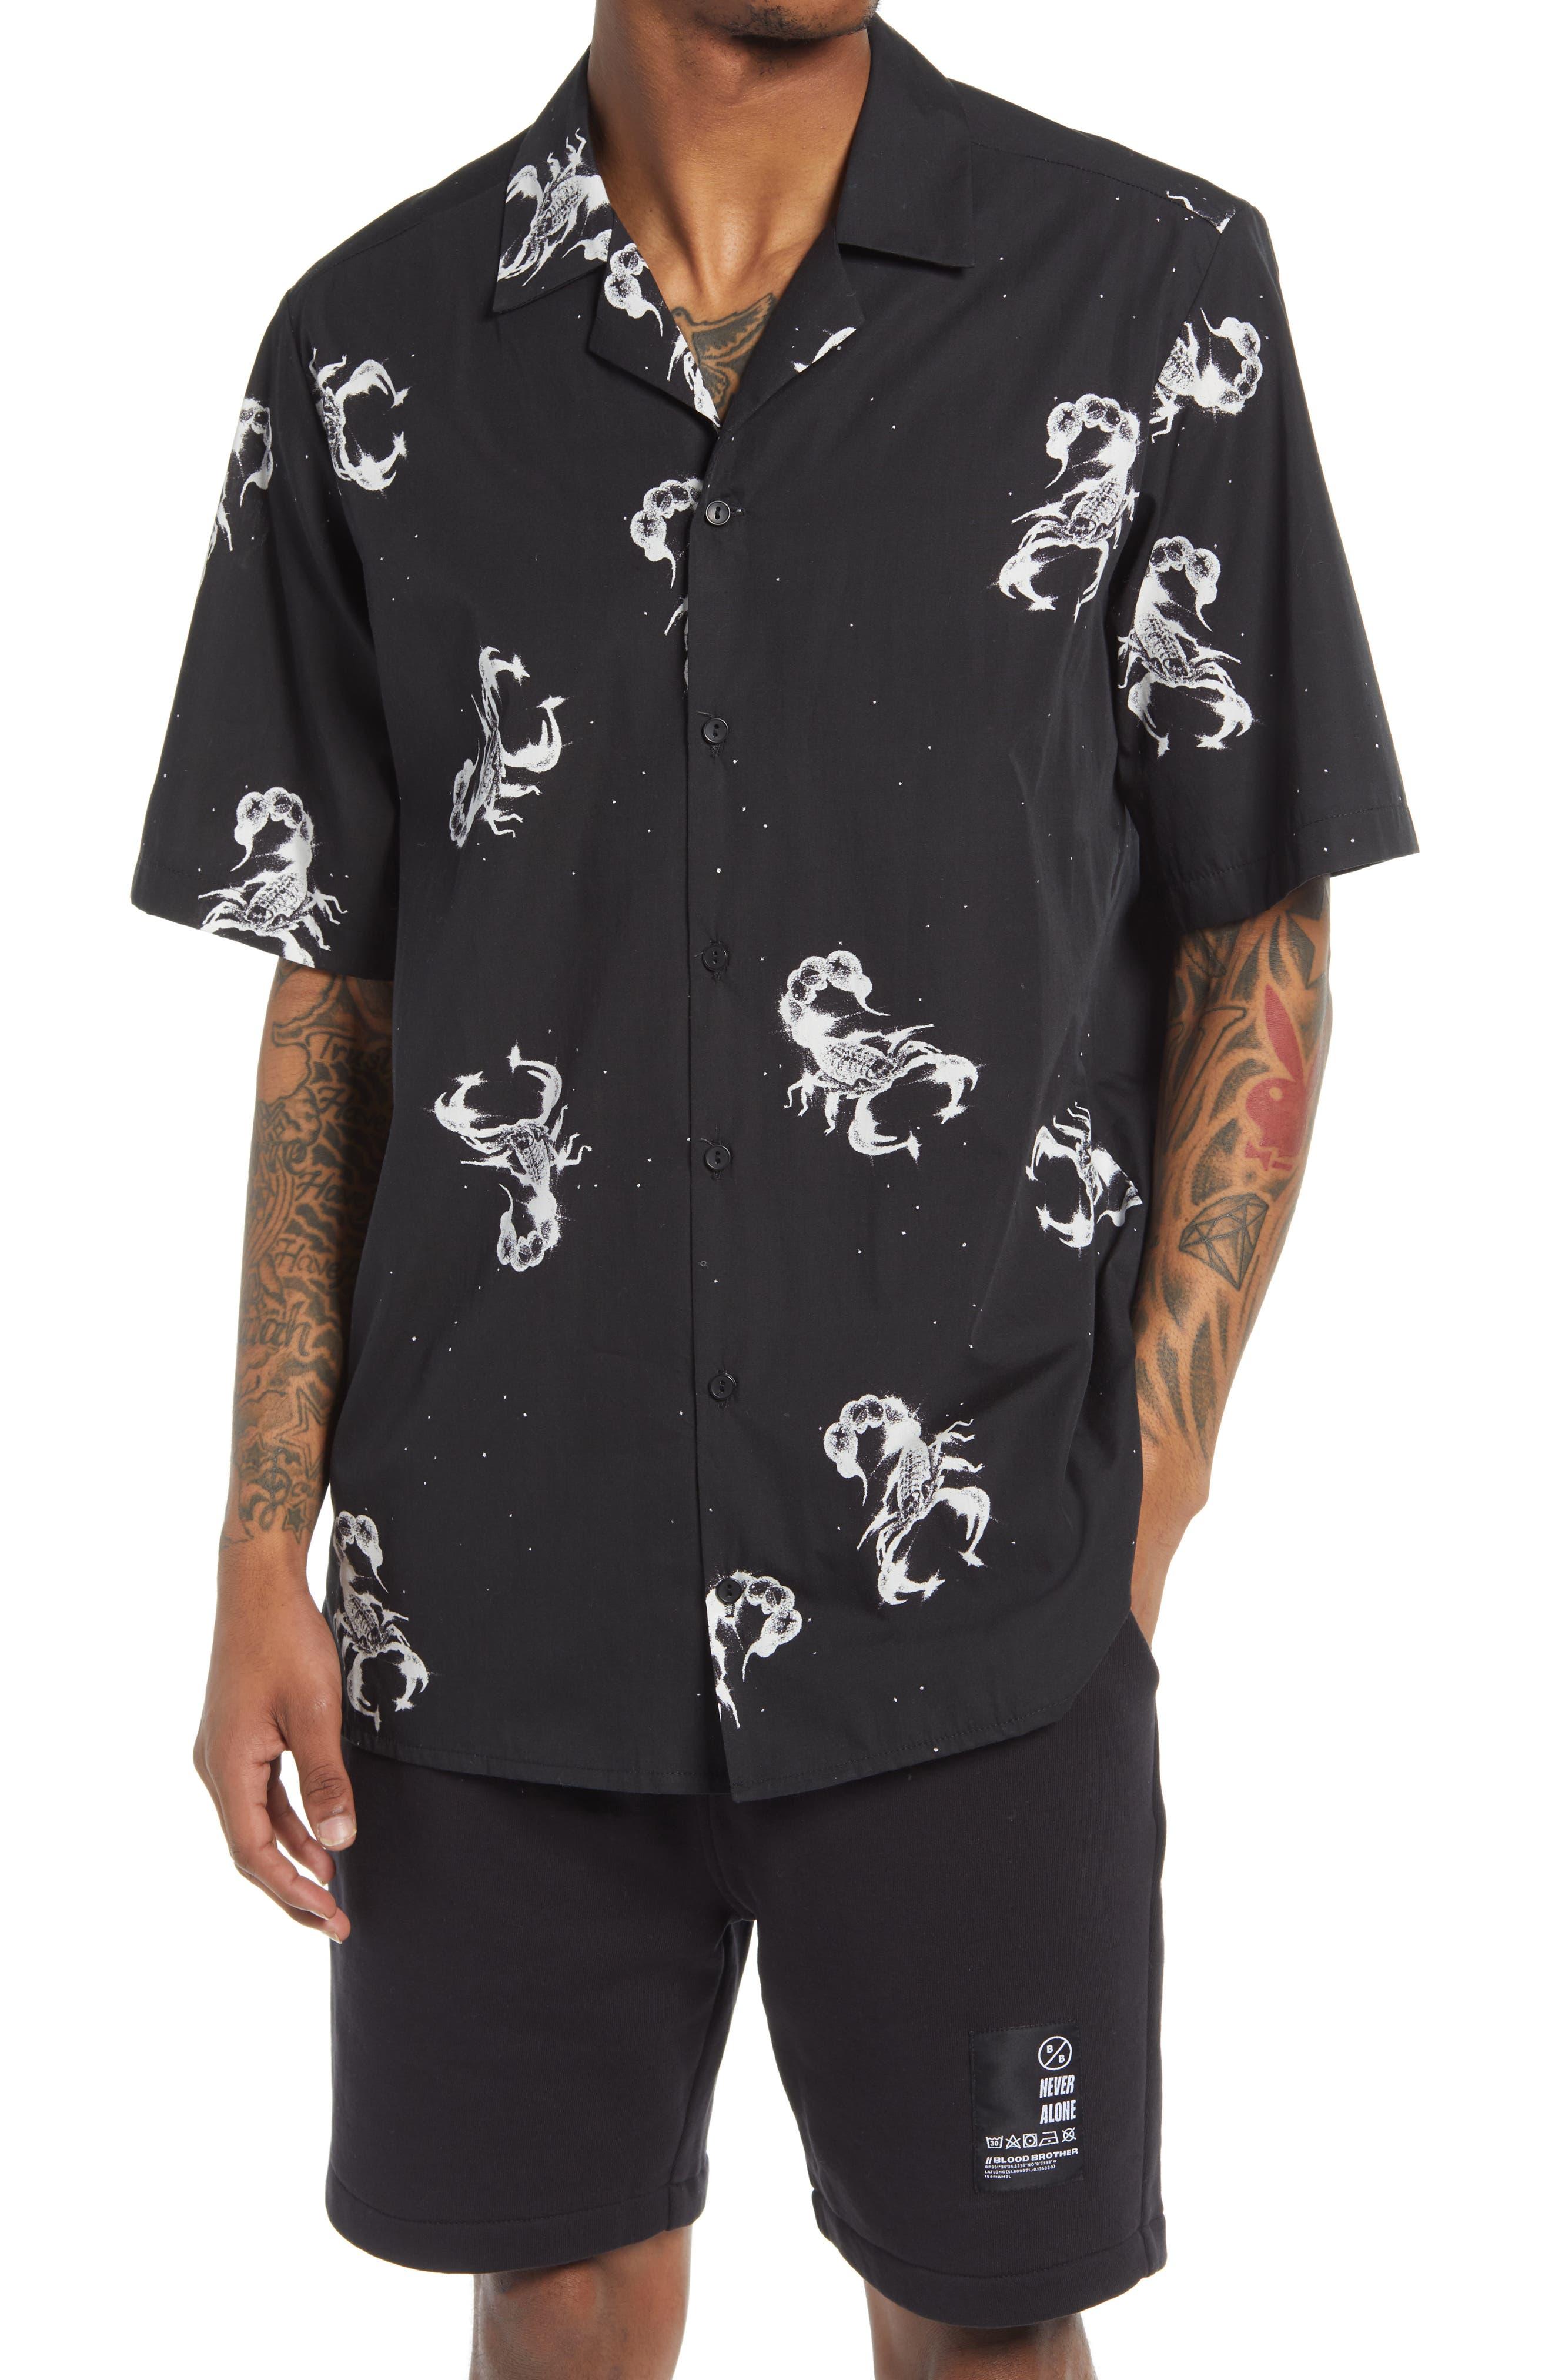 Wonderland 1044 Scorpion Short Sleeve Button-Up Camp Shirt